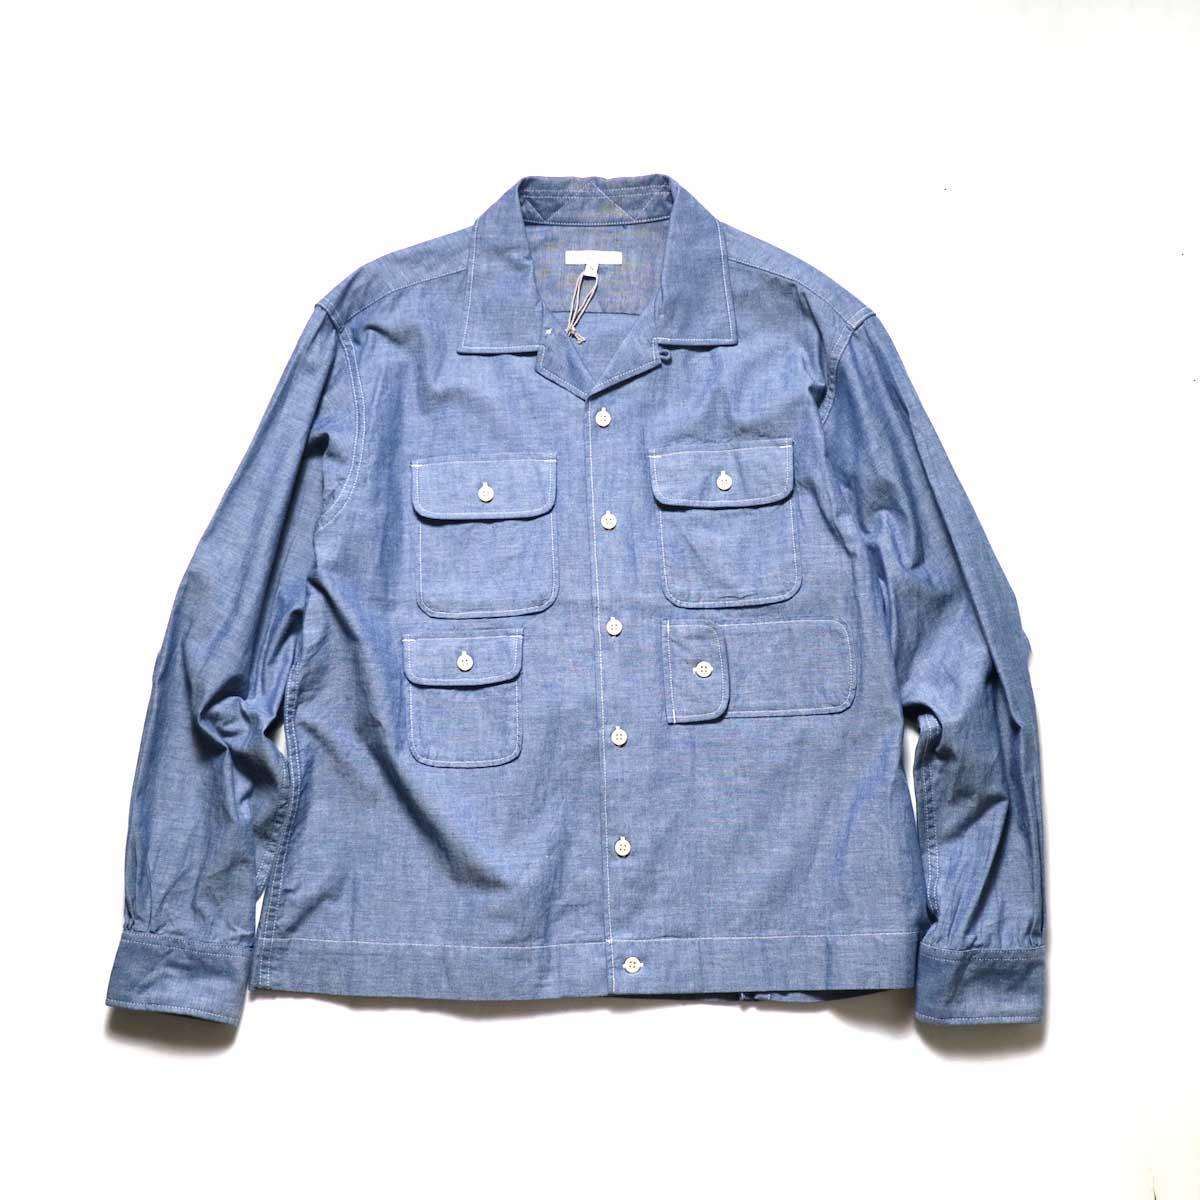 Engineered Garments / Bowling Shirt-Cotton Chambray (Blue)